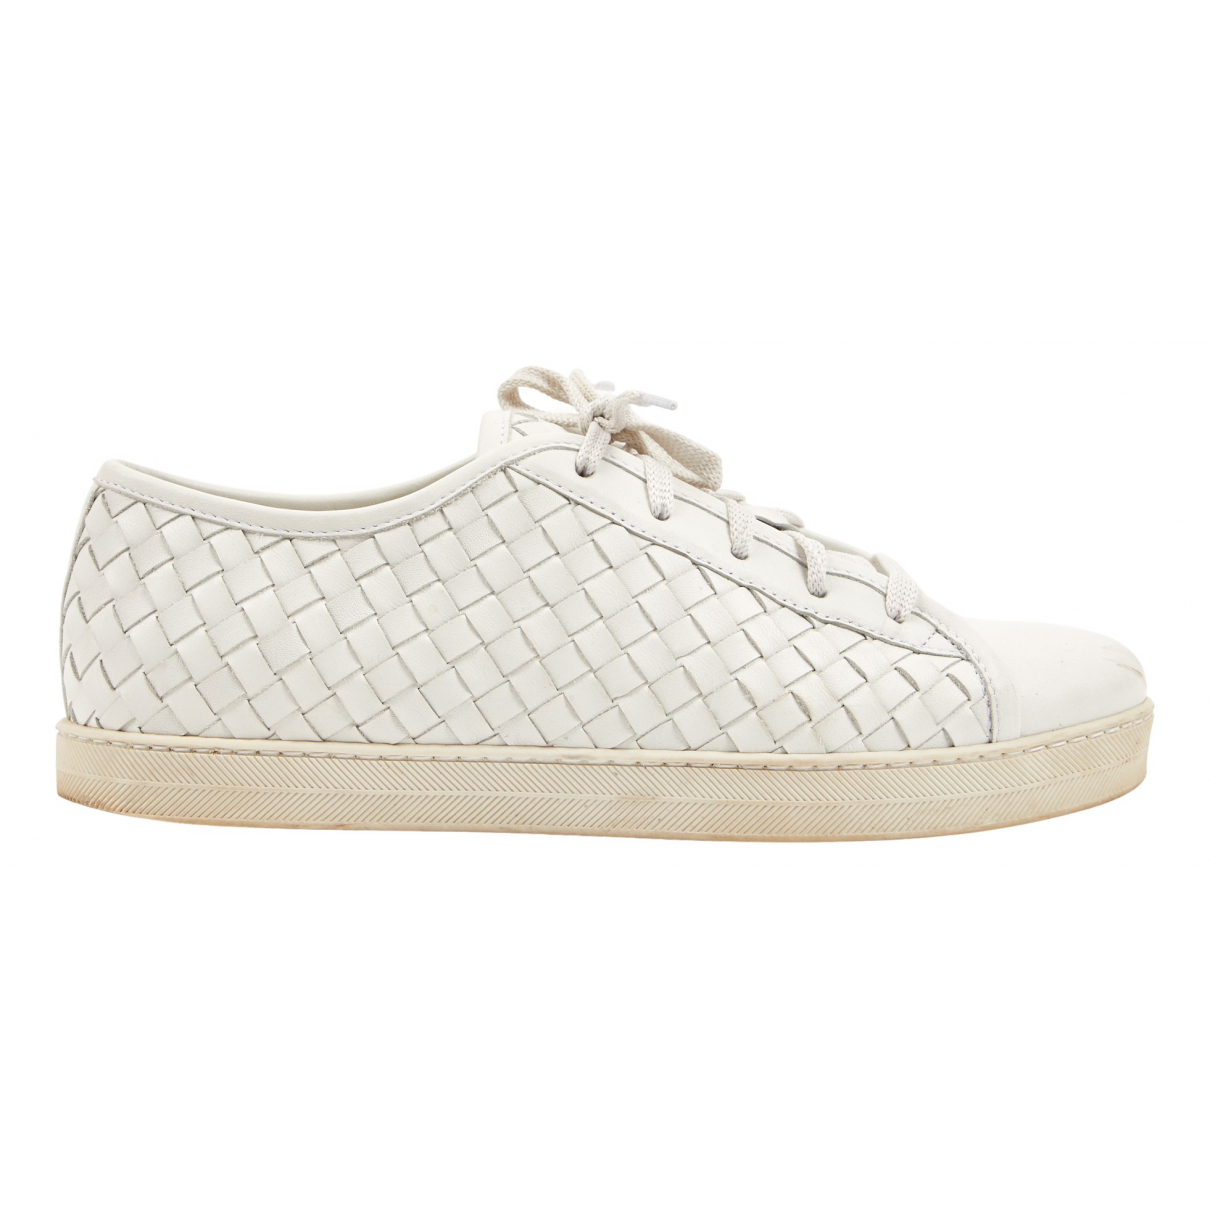 Bottega Veneta \N White Leather Trainers for Women 38.5 EU